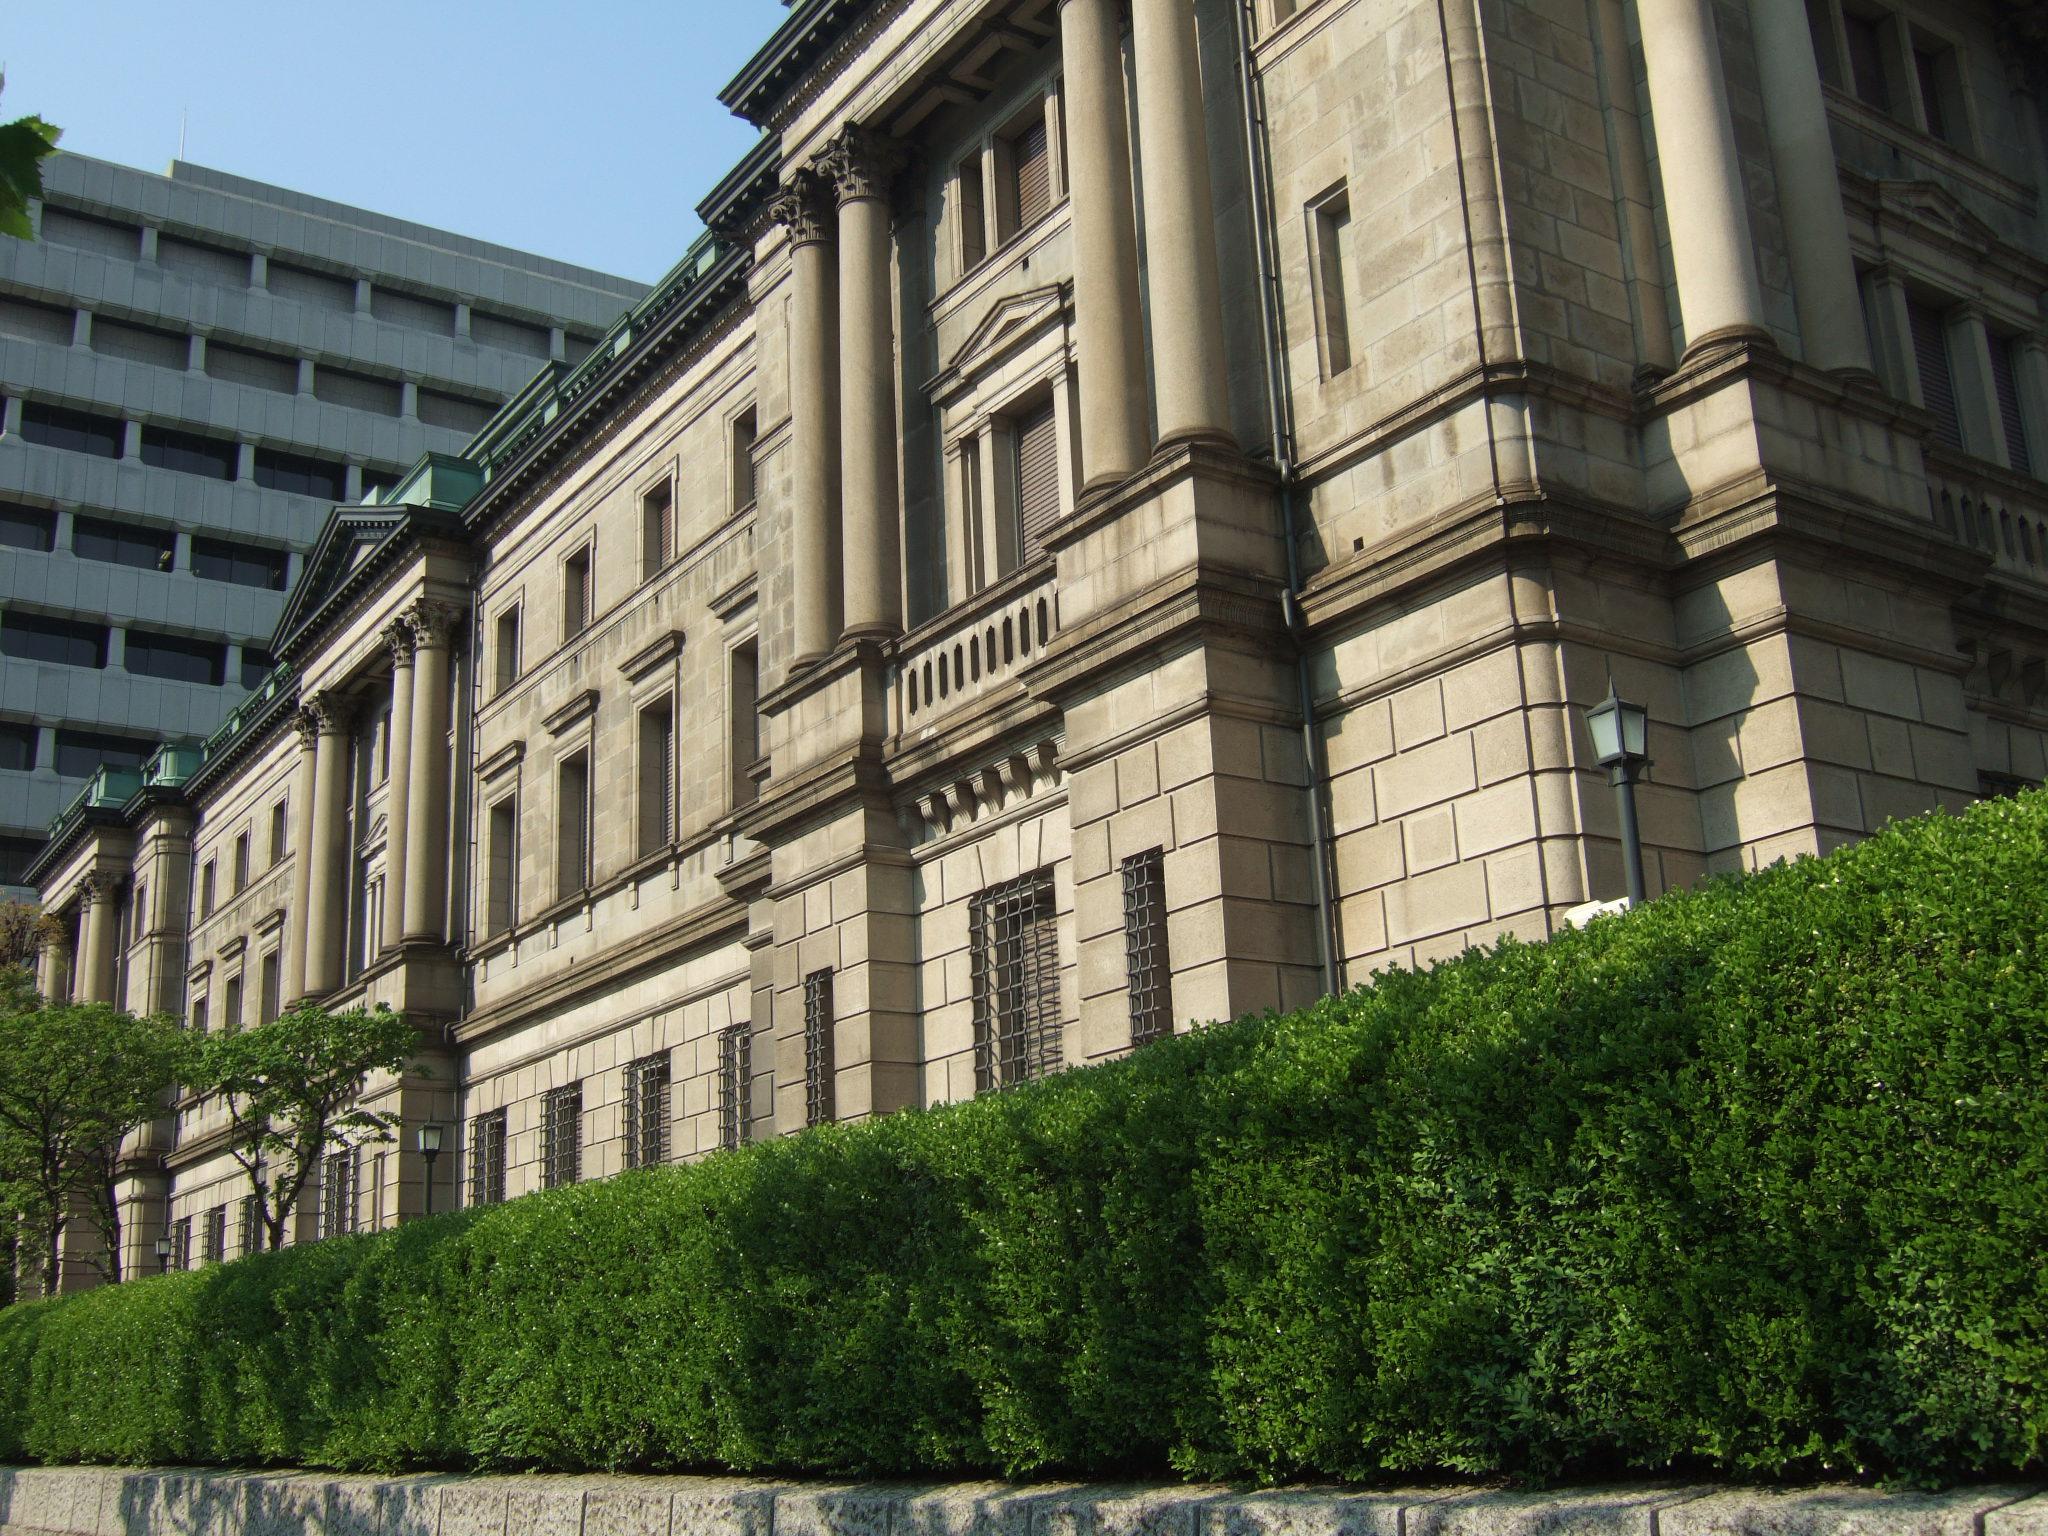 http://upload.wikimedia.org/wikipedia/commons/0/0b/Bank_of_Japan.jpg